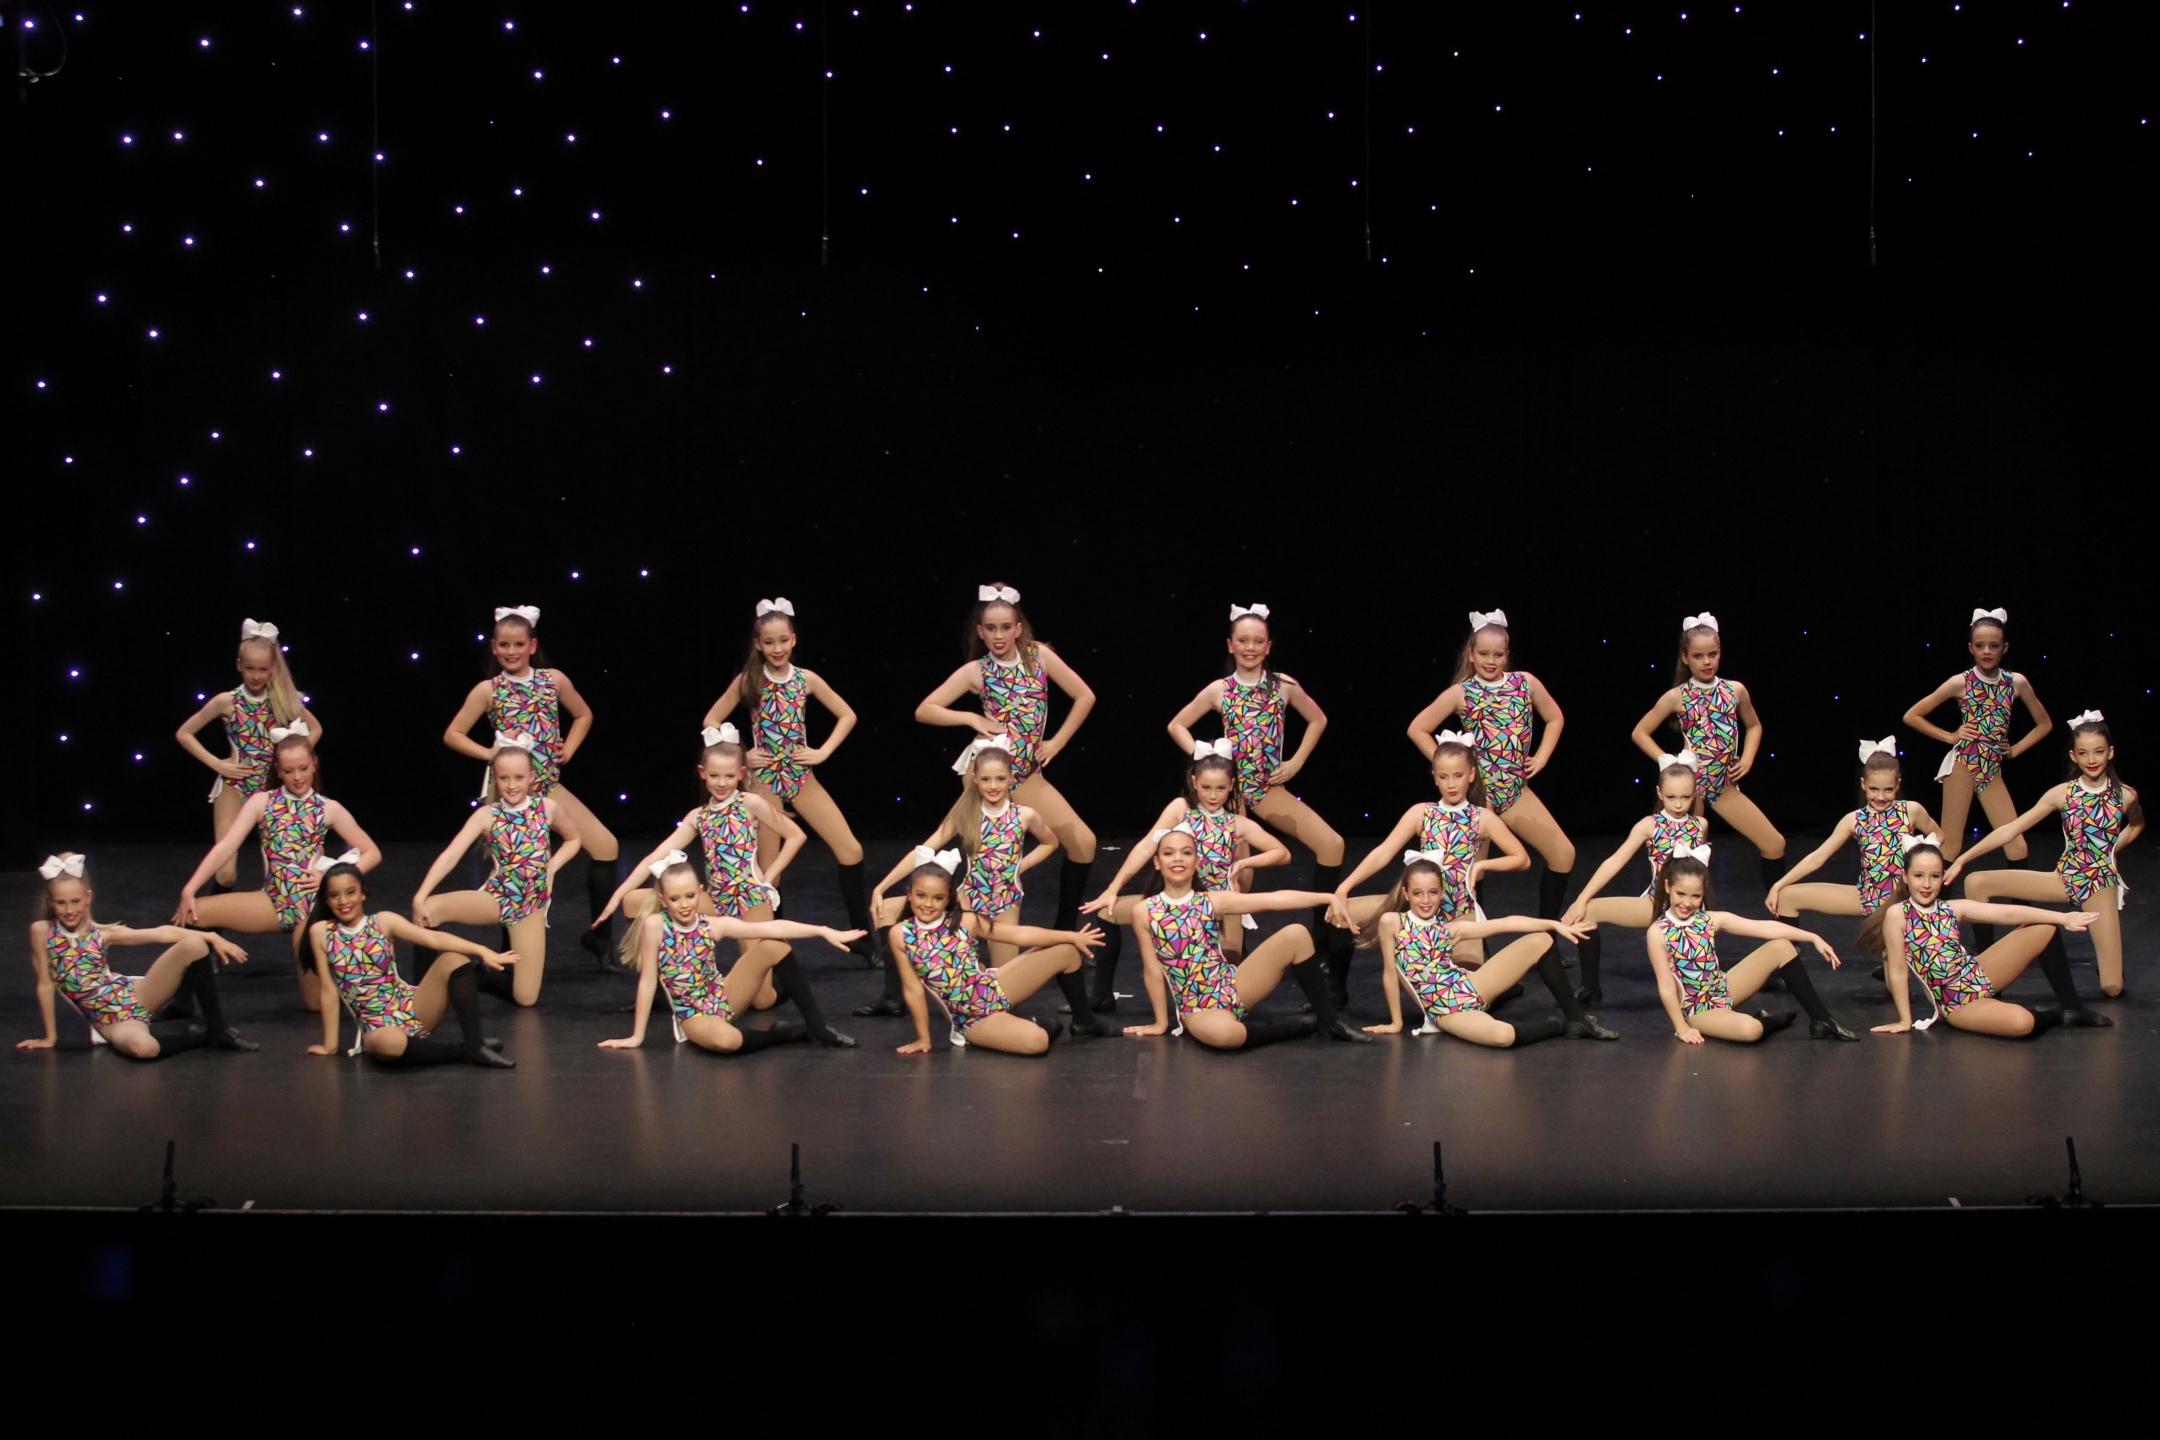 Jazz dance for children - team  Danzart - dance teams